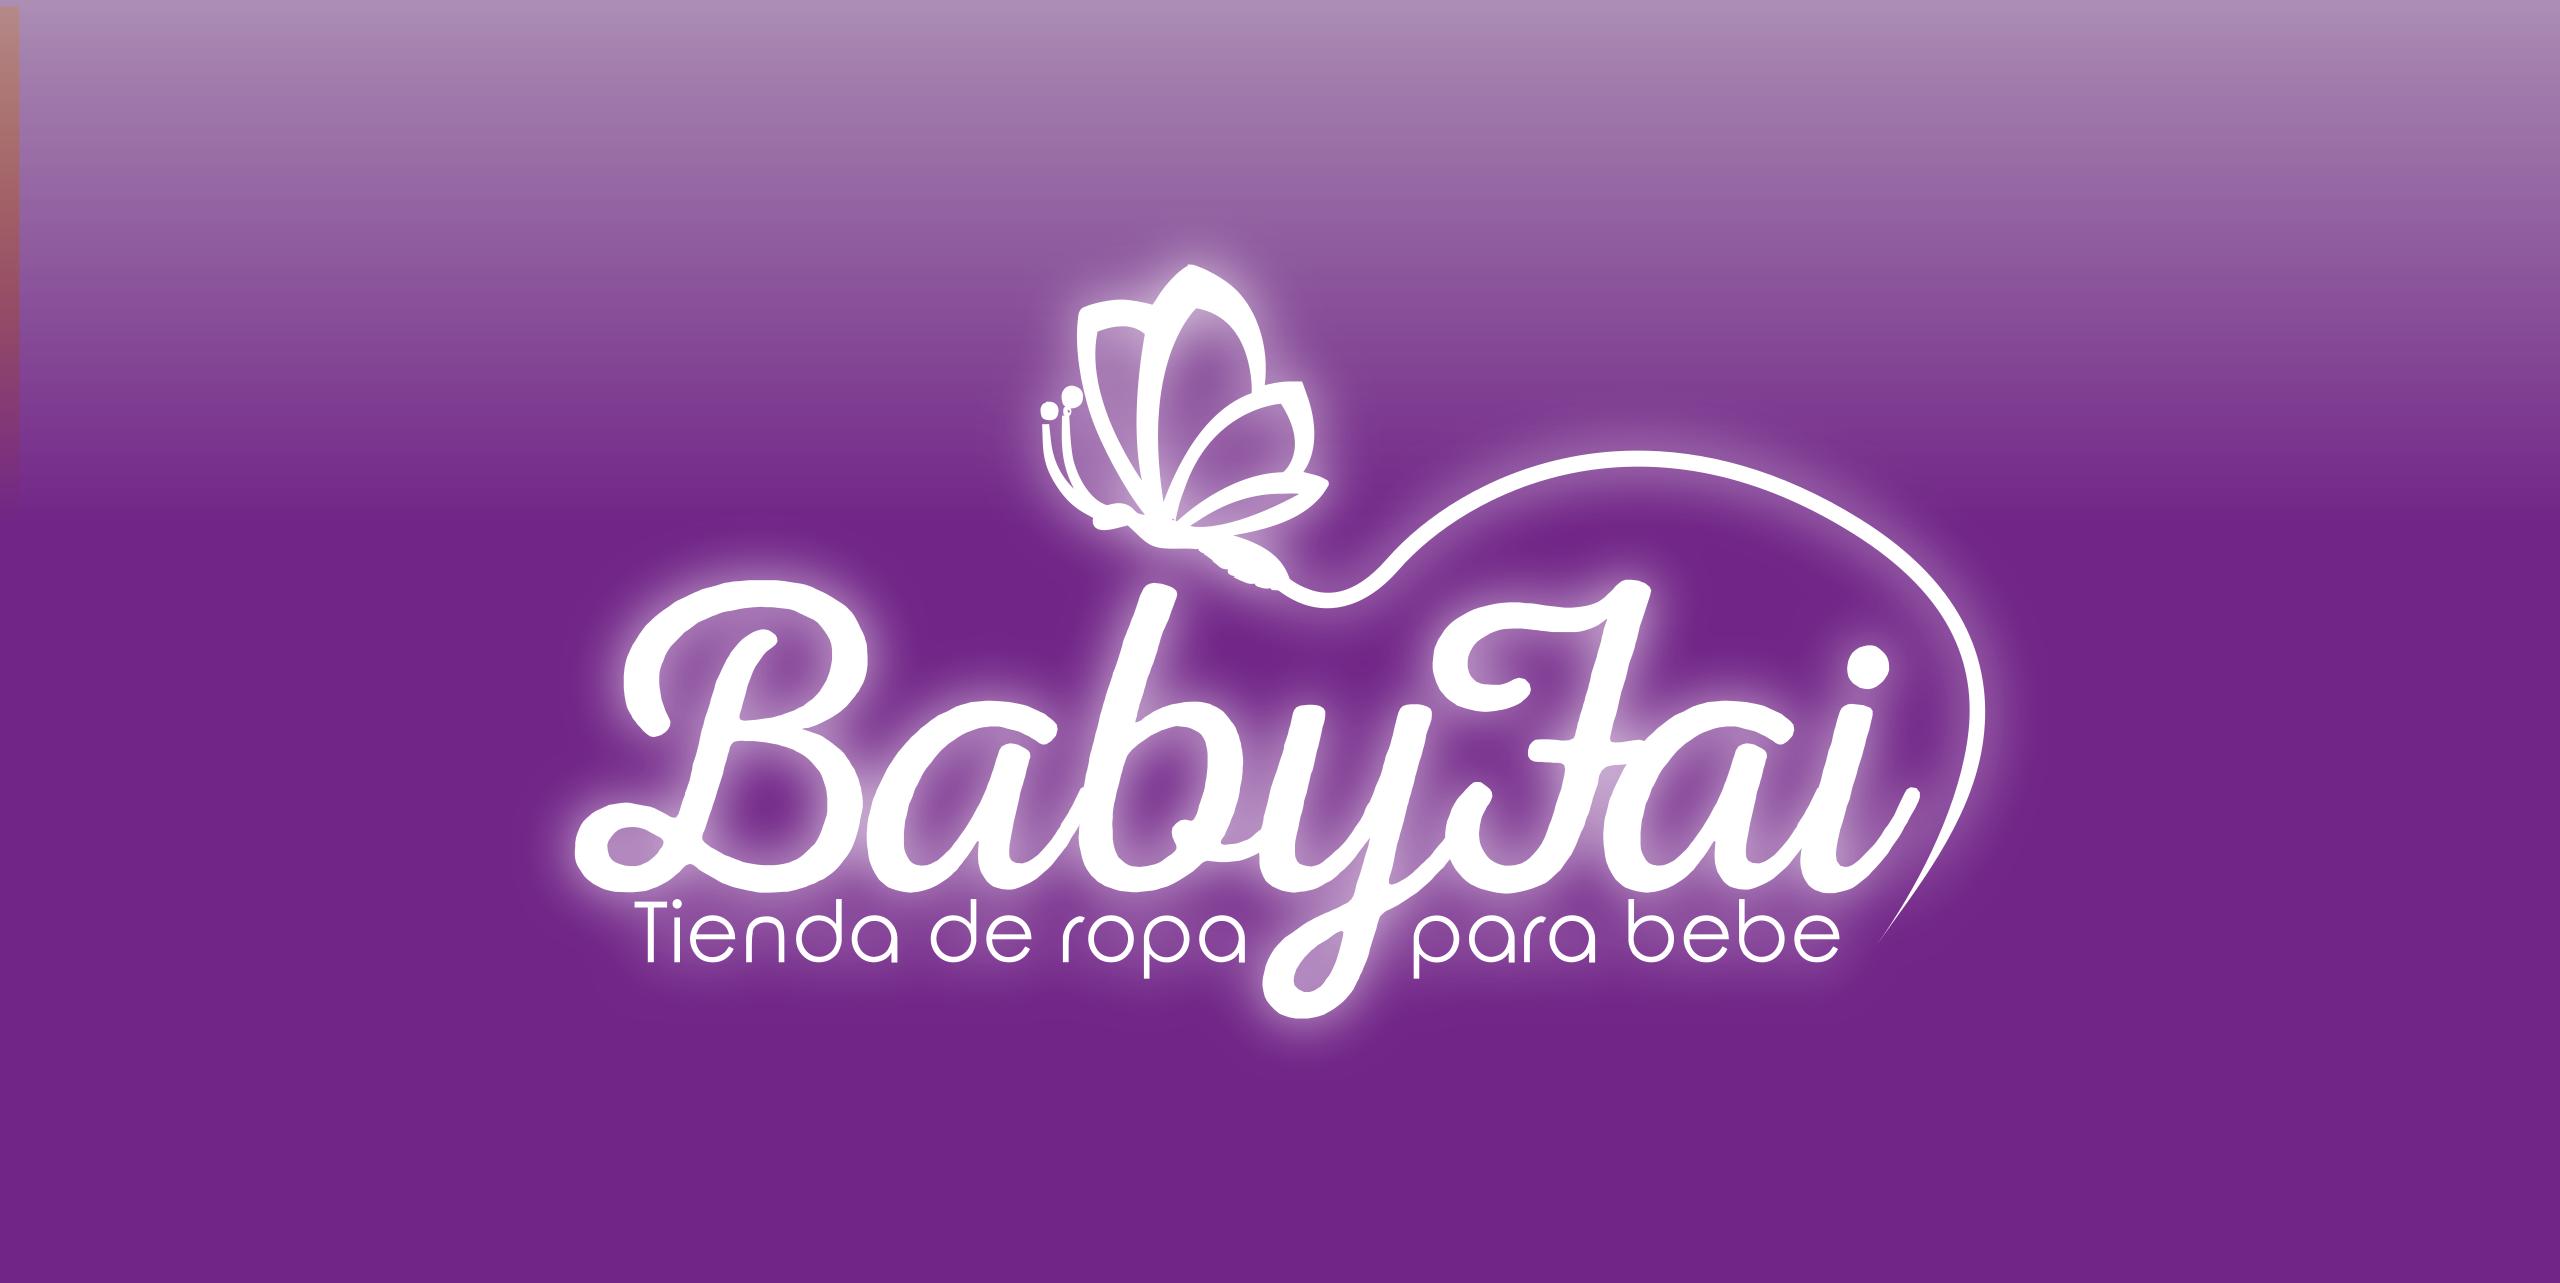 BabyFai - tienda de ropa para bebe